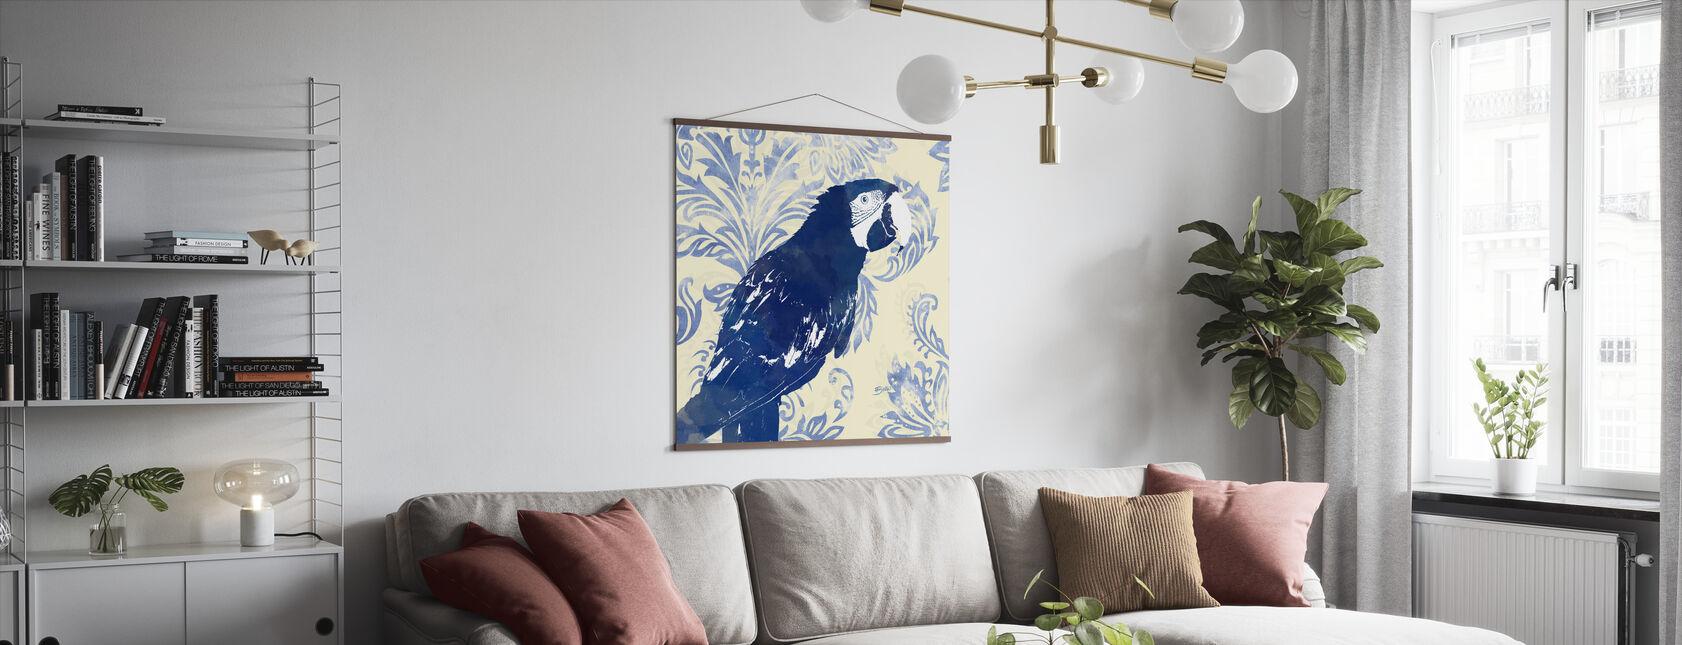 Indigo Parrot 1 - Poster - Living Room